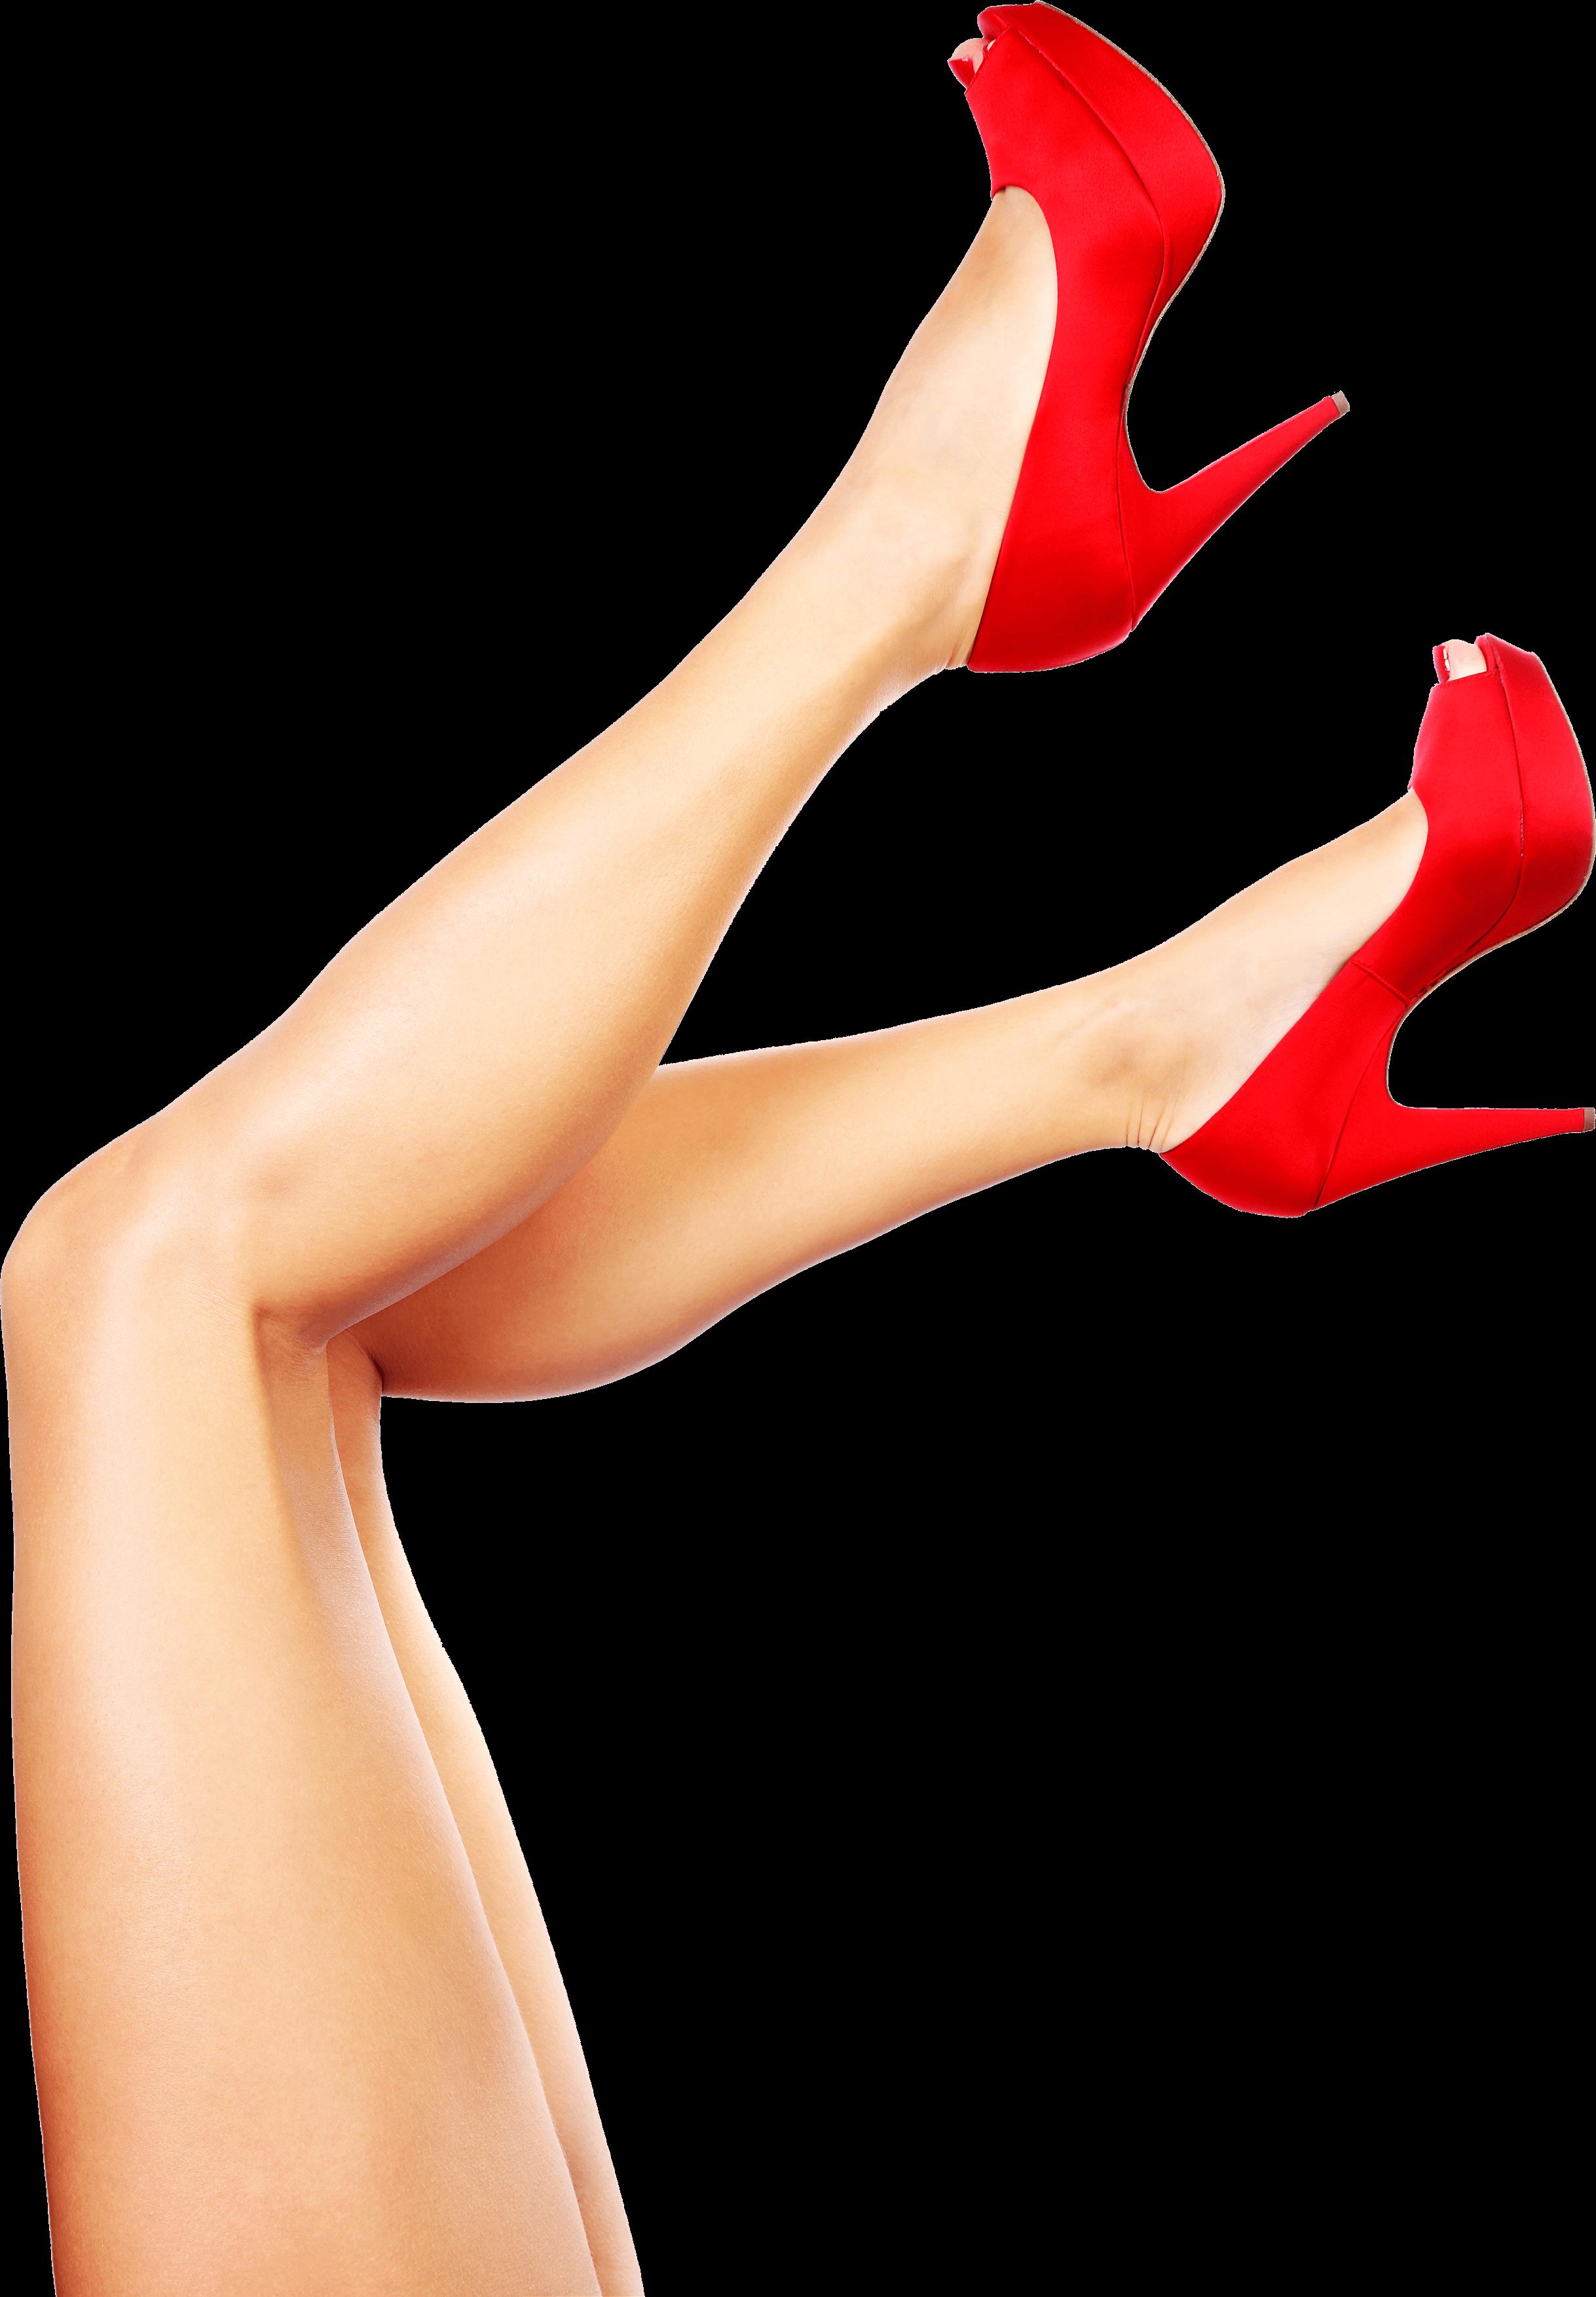 Female Leg PNG Image - Leg PNG